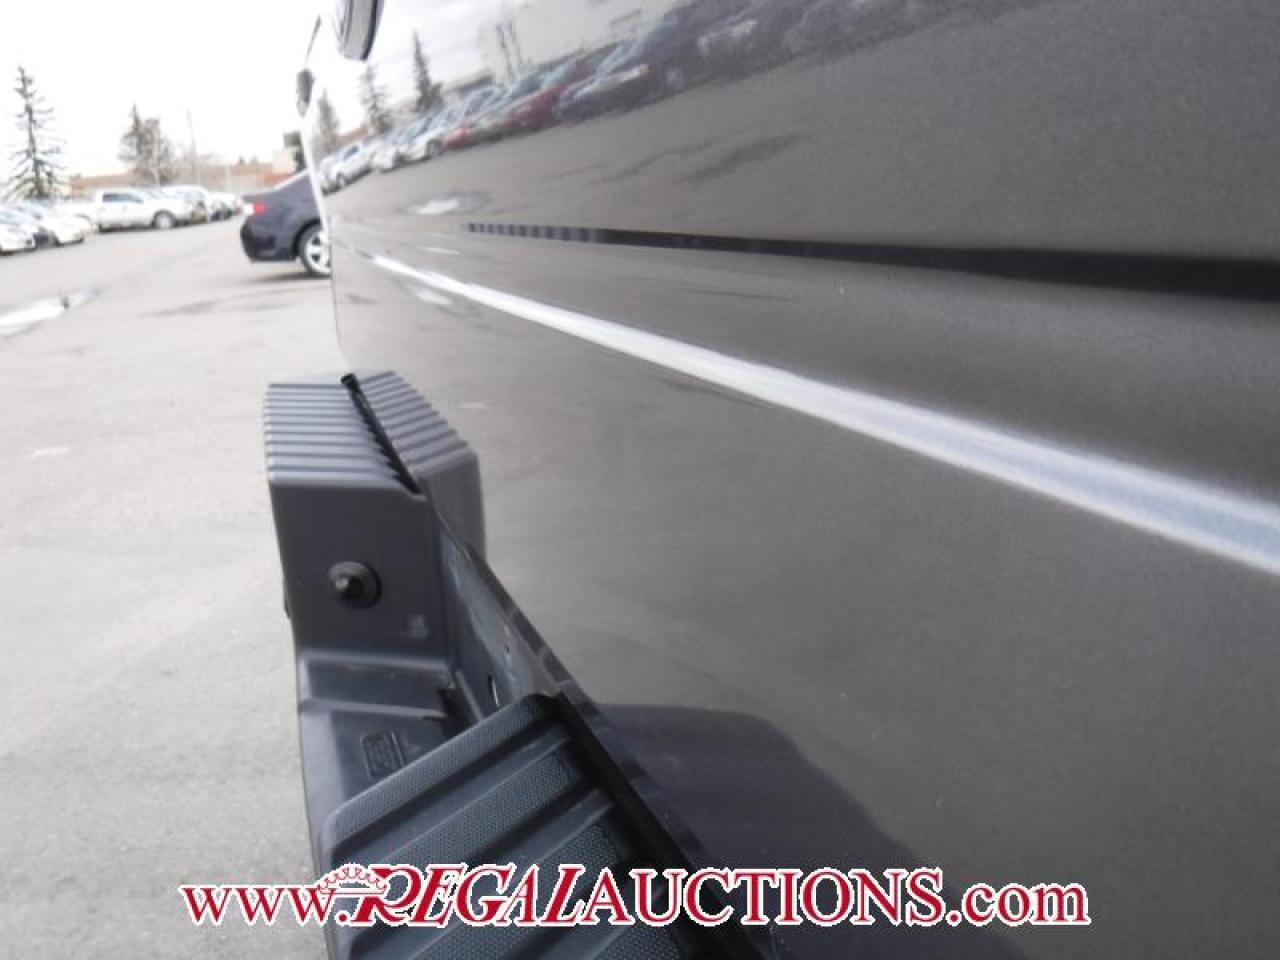 2009 Ford F150 XLT SUPERCREW 4WD 5.4L